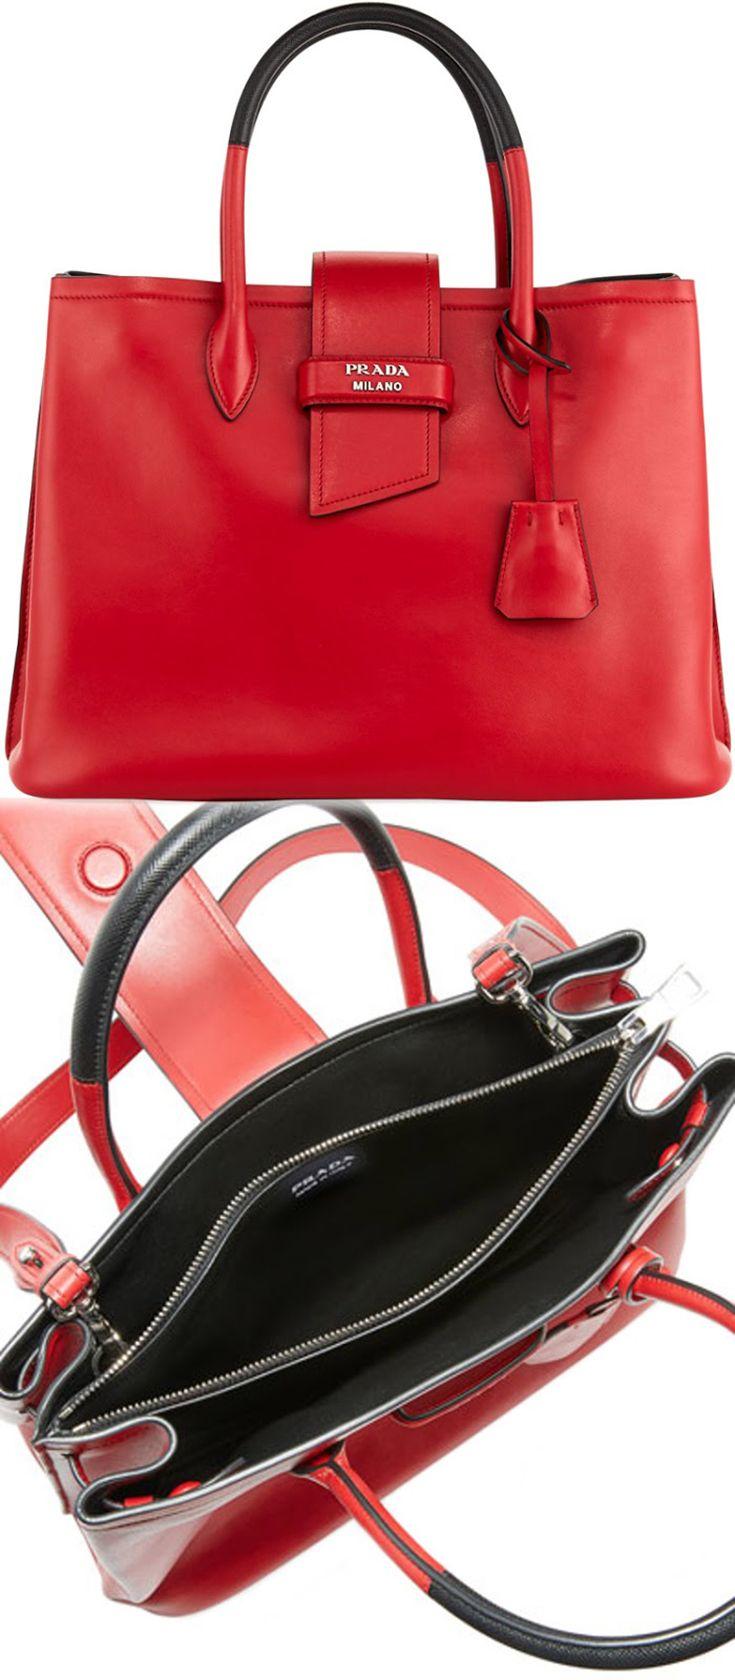 Statement Bag - My Mondrian Bag by VIDA VIDA VFWPiv